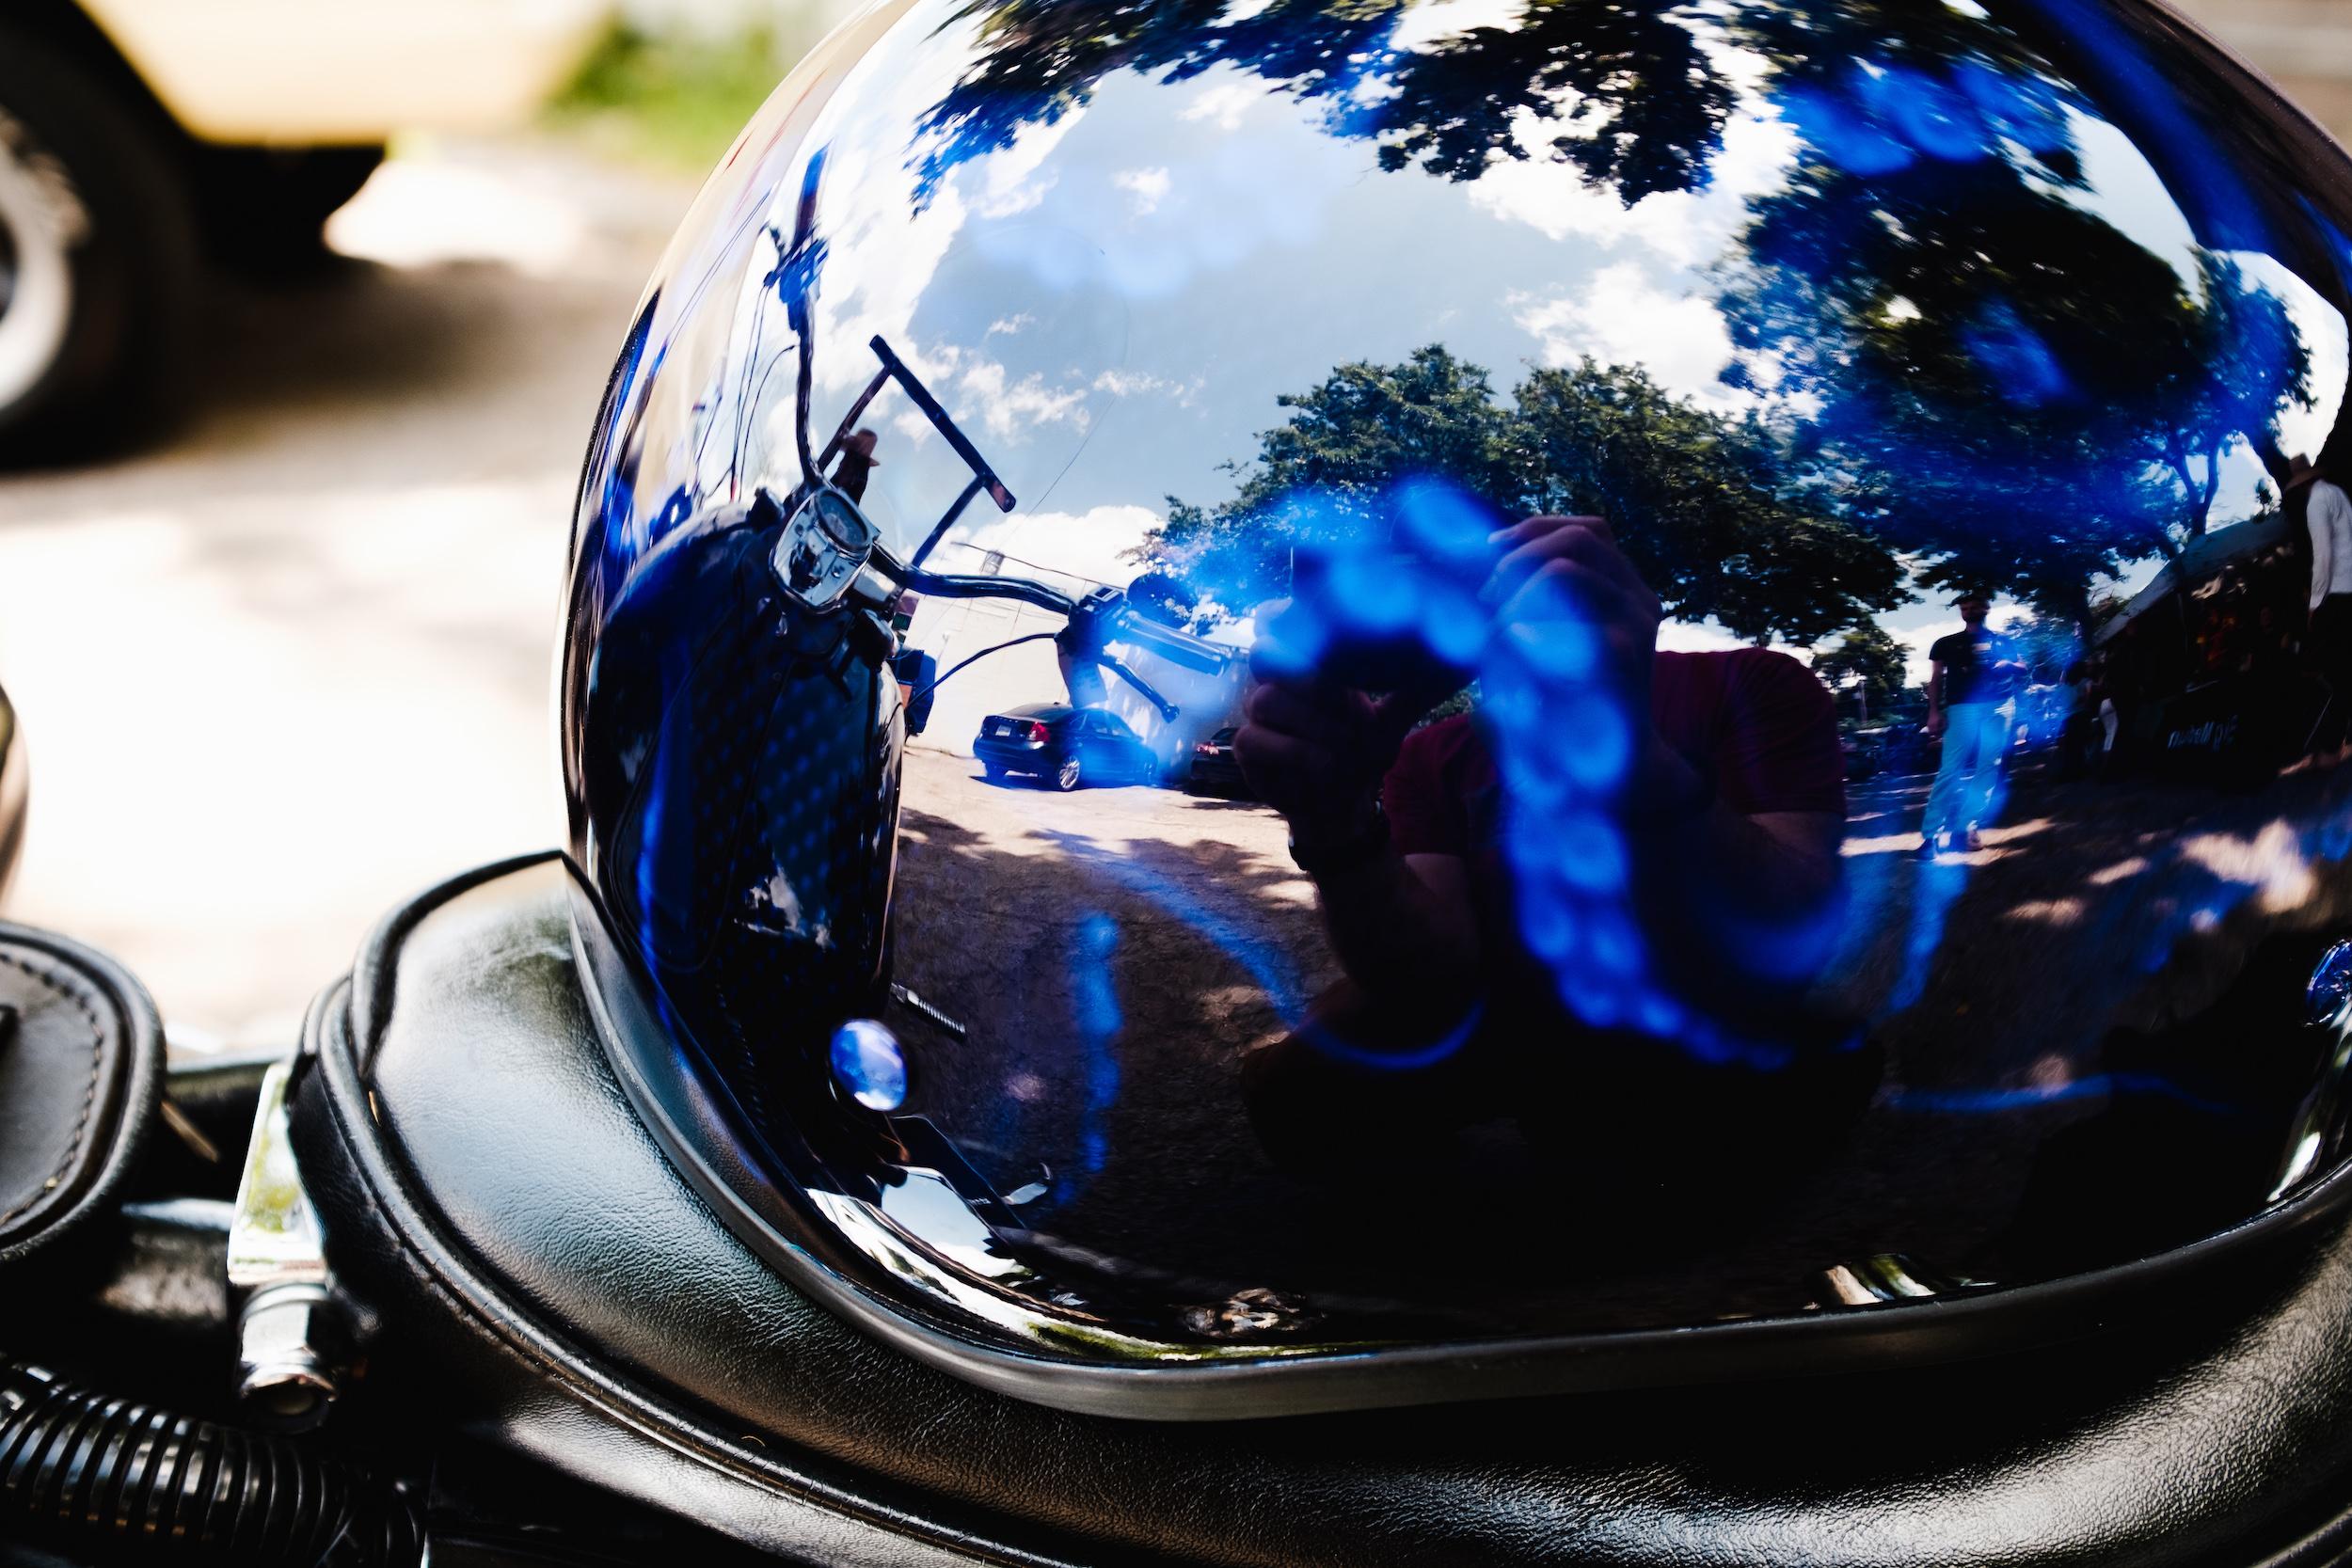 helmet_reflection.jpg